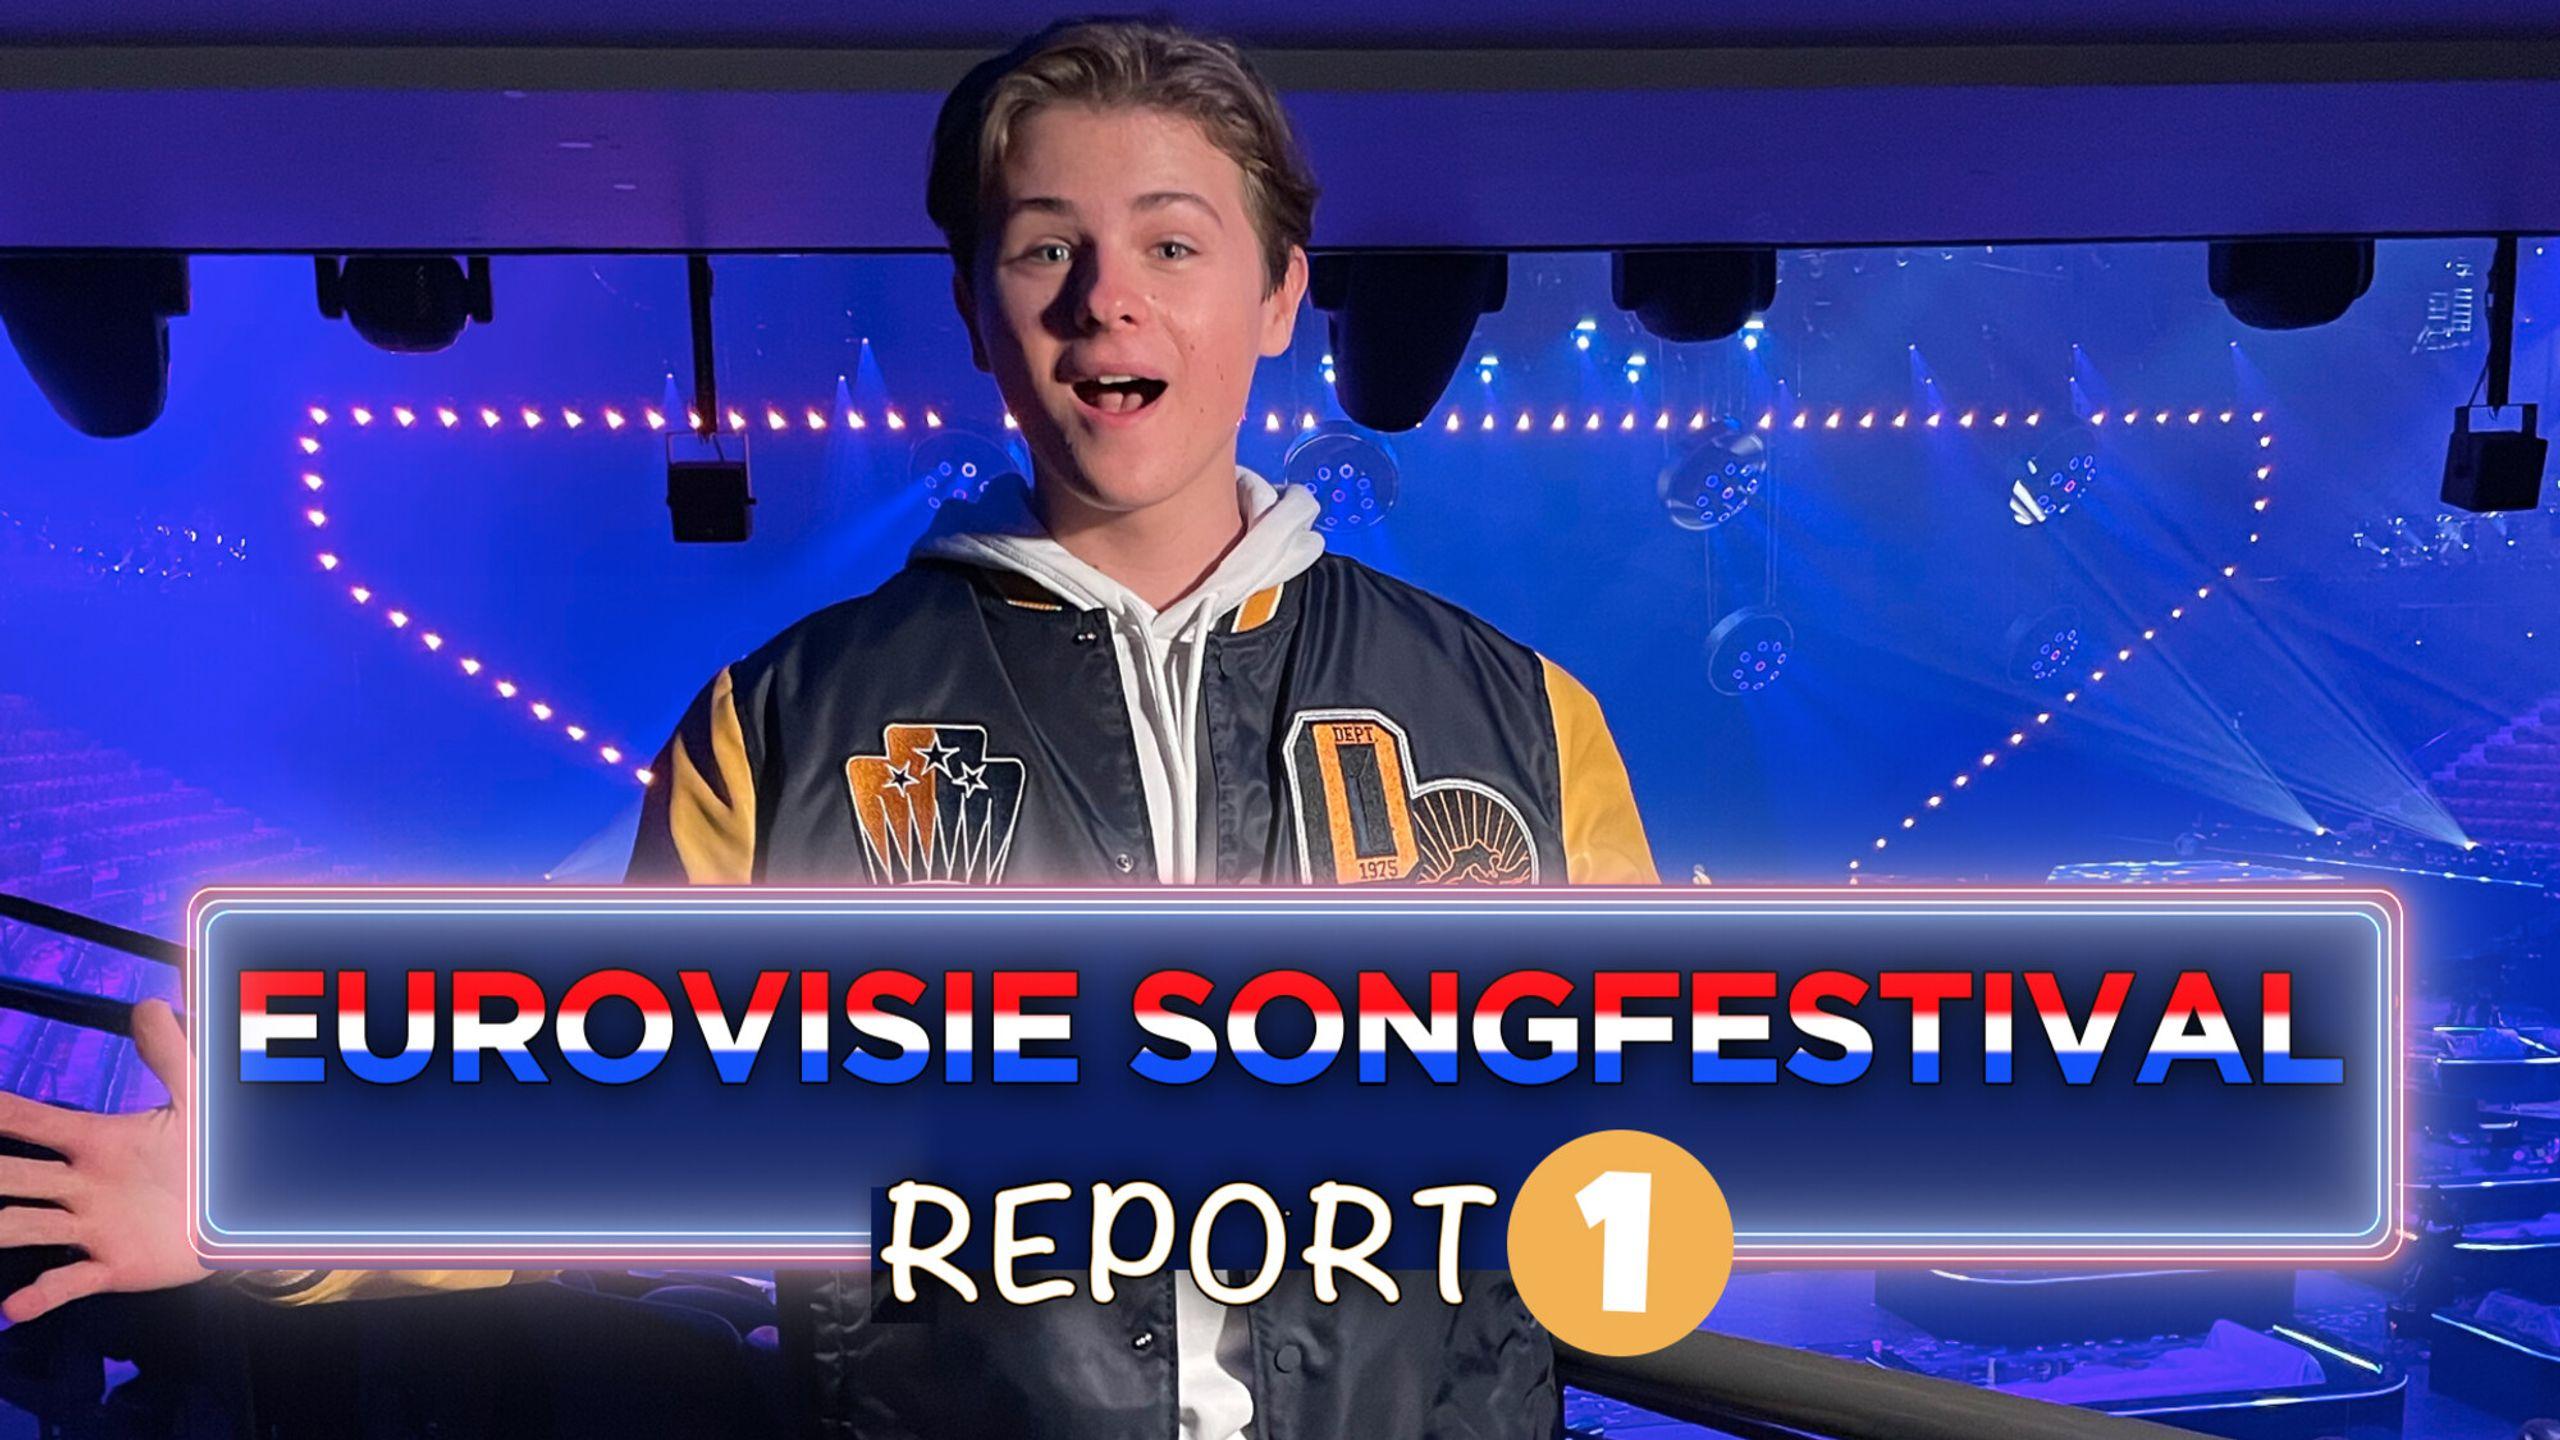 Zapp Eurovisie Songfestival Reports